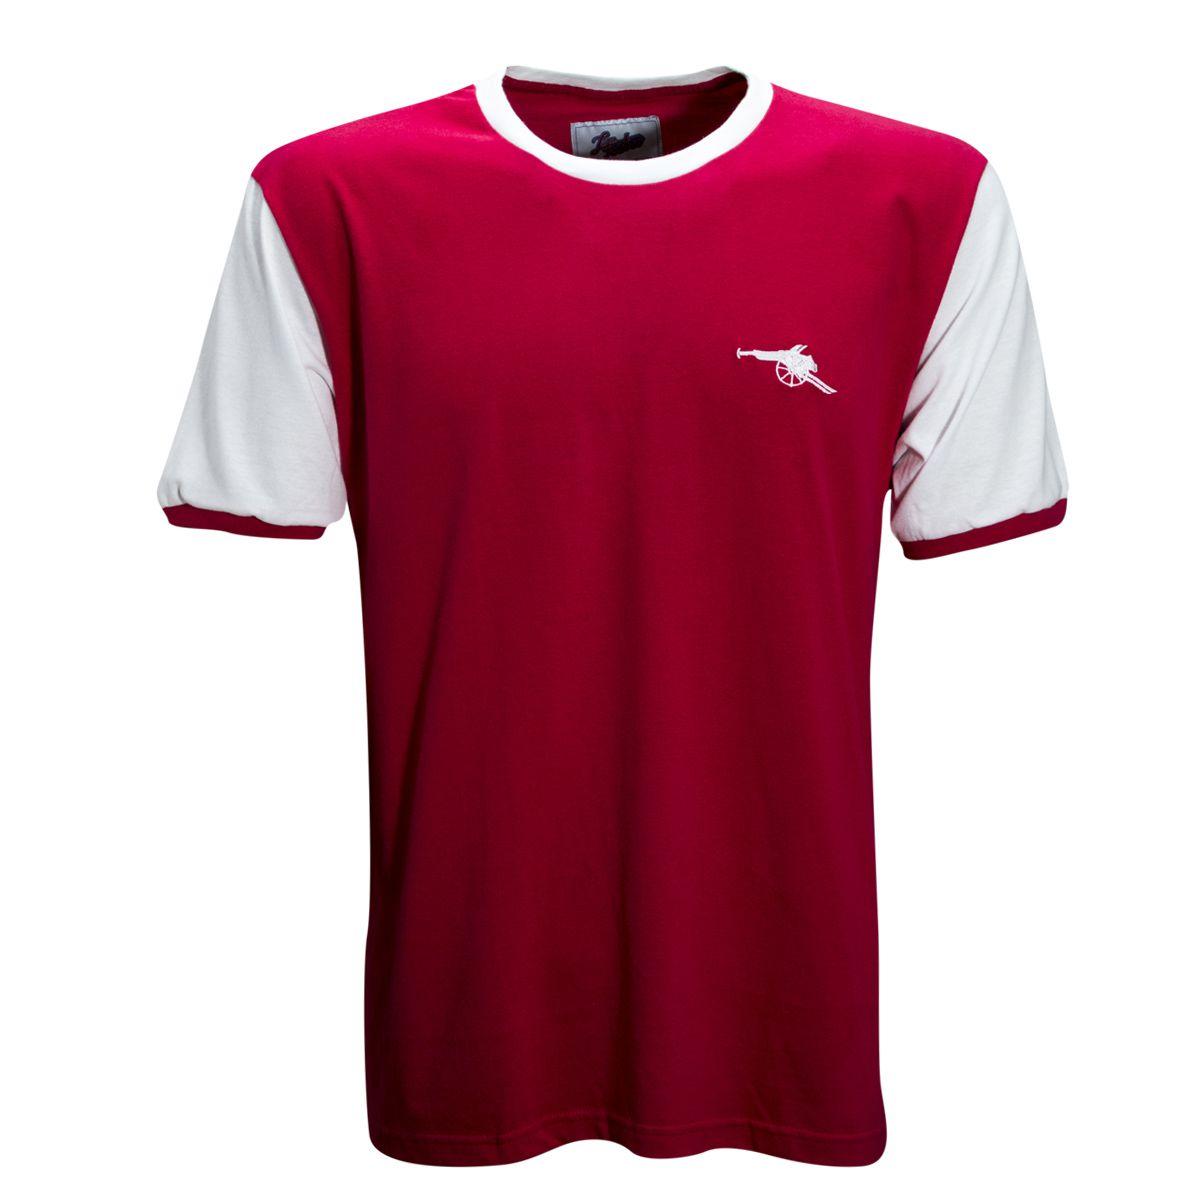 Camisa Arsenal 1971 Liga Retro - LRARS71